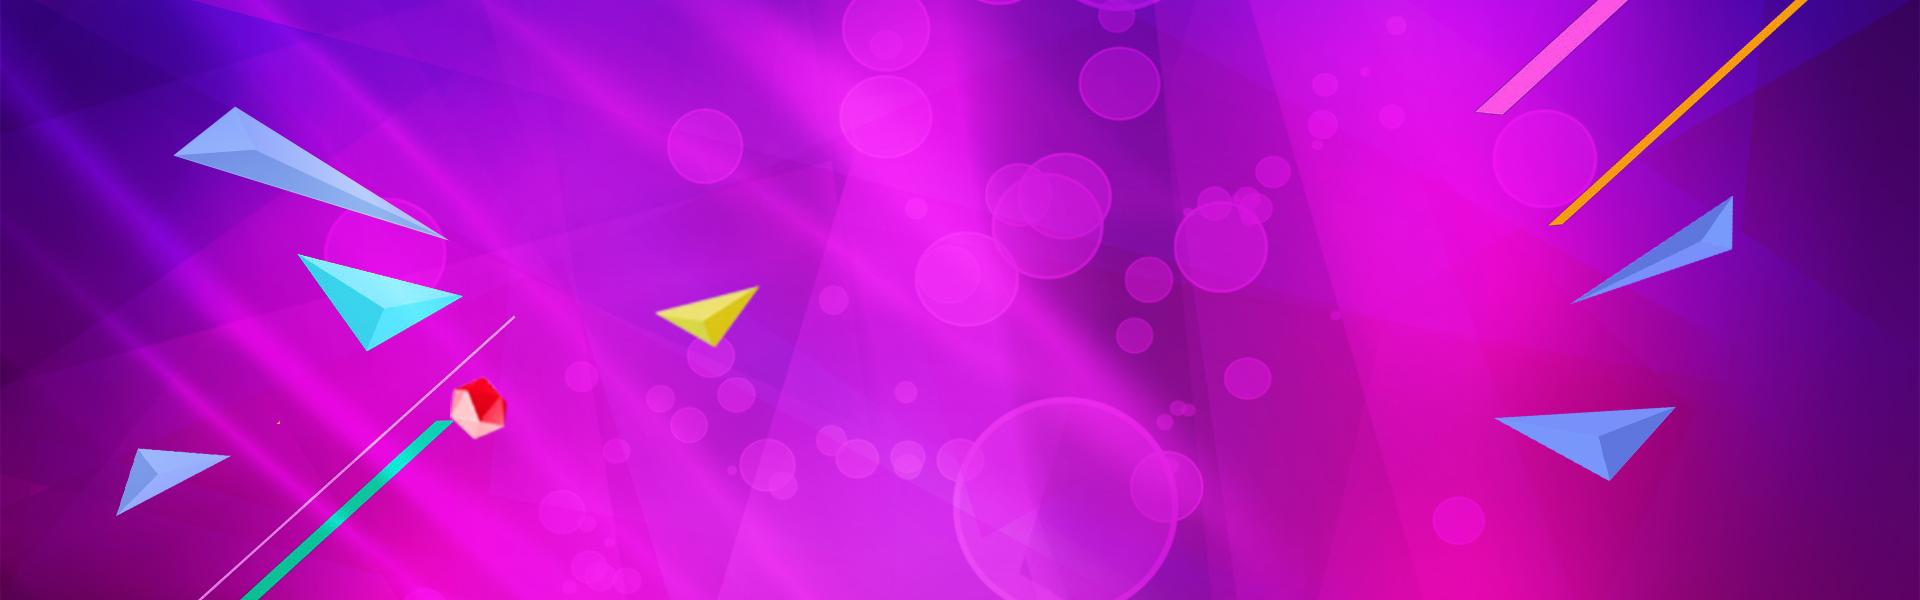 a roxa do tri u00e2ngulo splash banner simples roxo halo